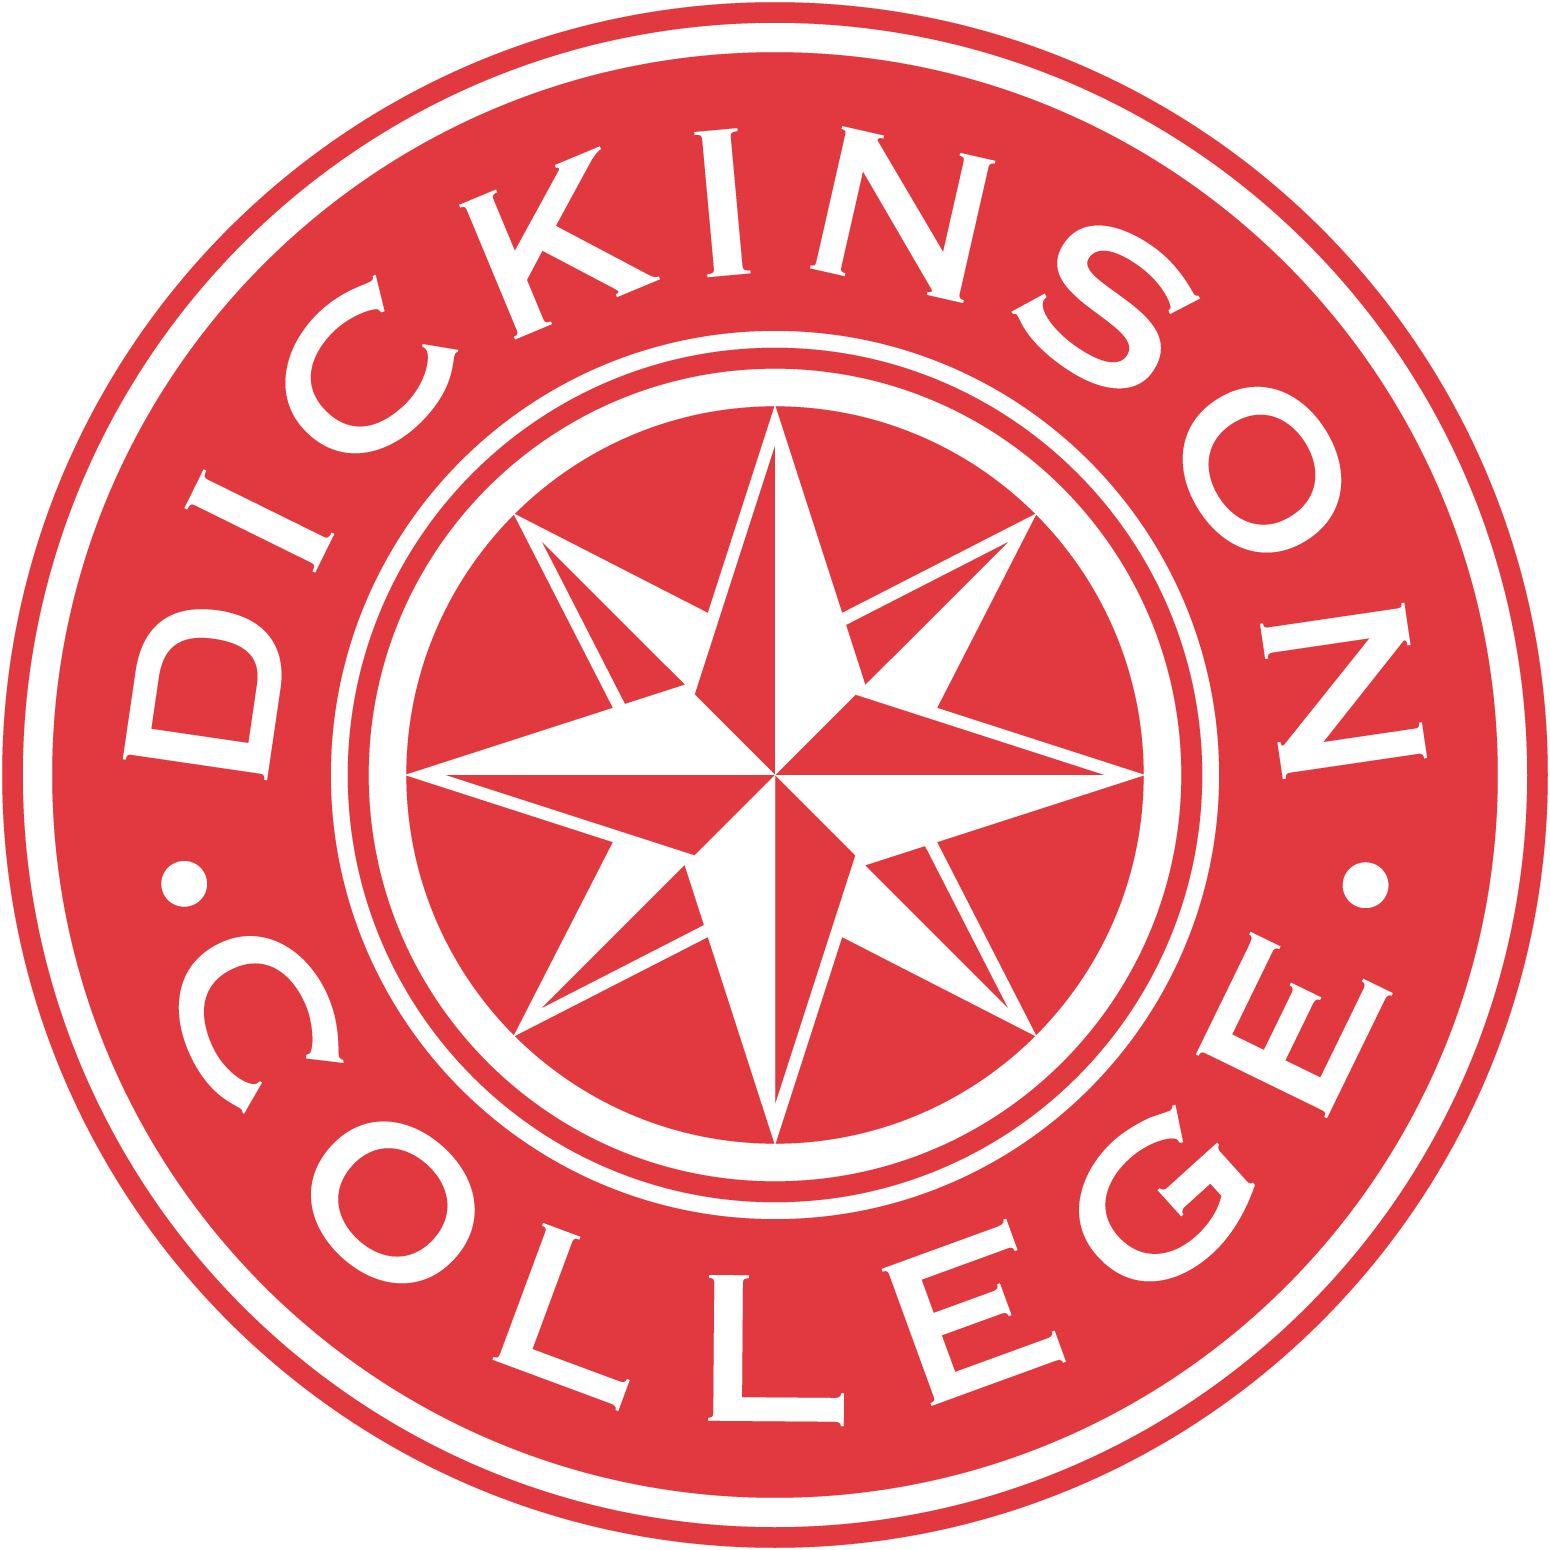 on sale 6a66f 374d3 Dickinson College | My teams stuff | Dickinson college ...